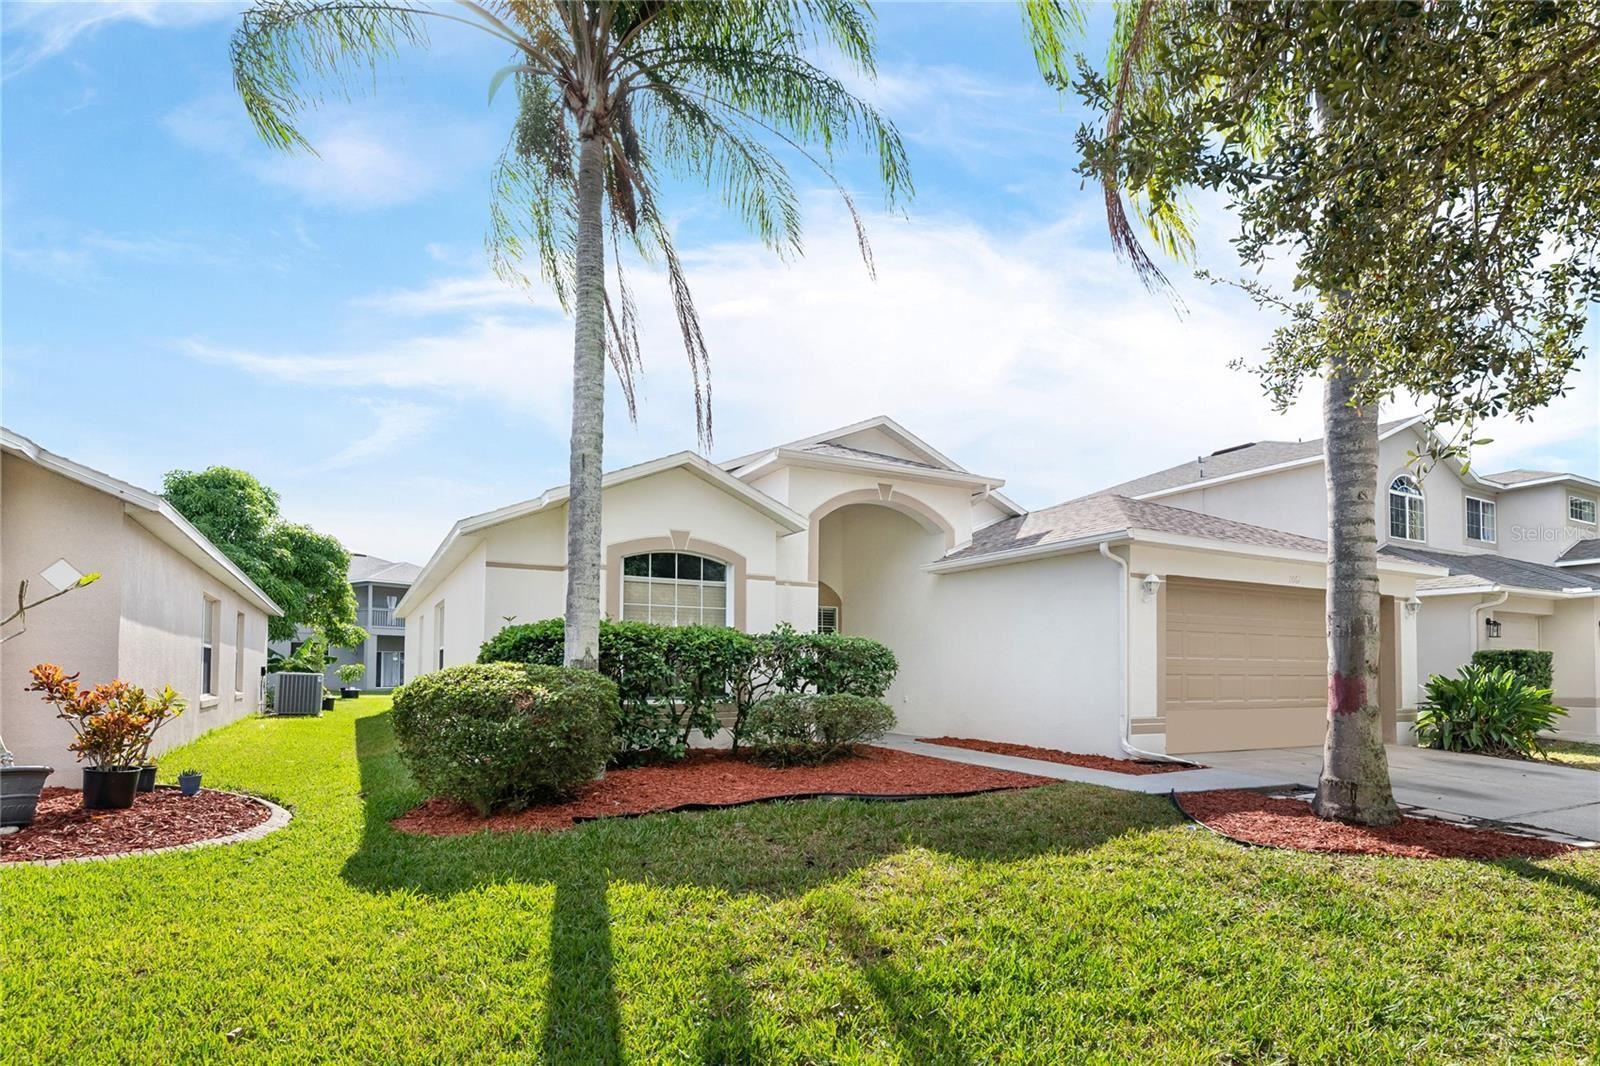 1061 PORTMOOR WAY, Winter Garden, FL 34787 - #: O5971558